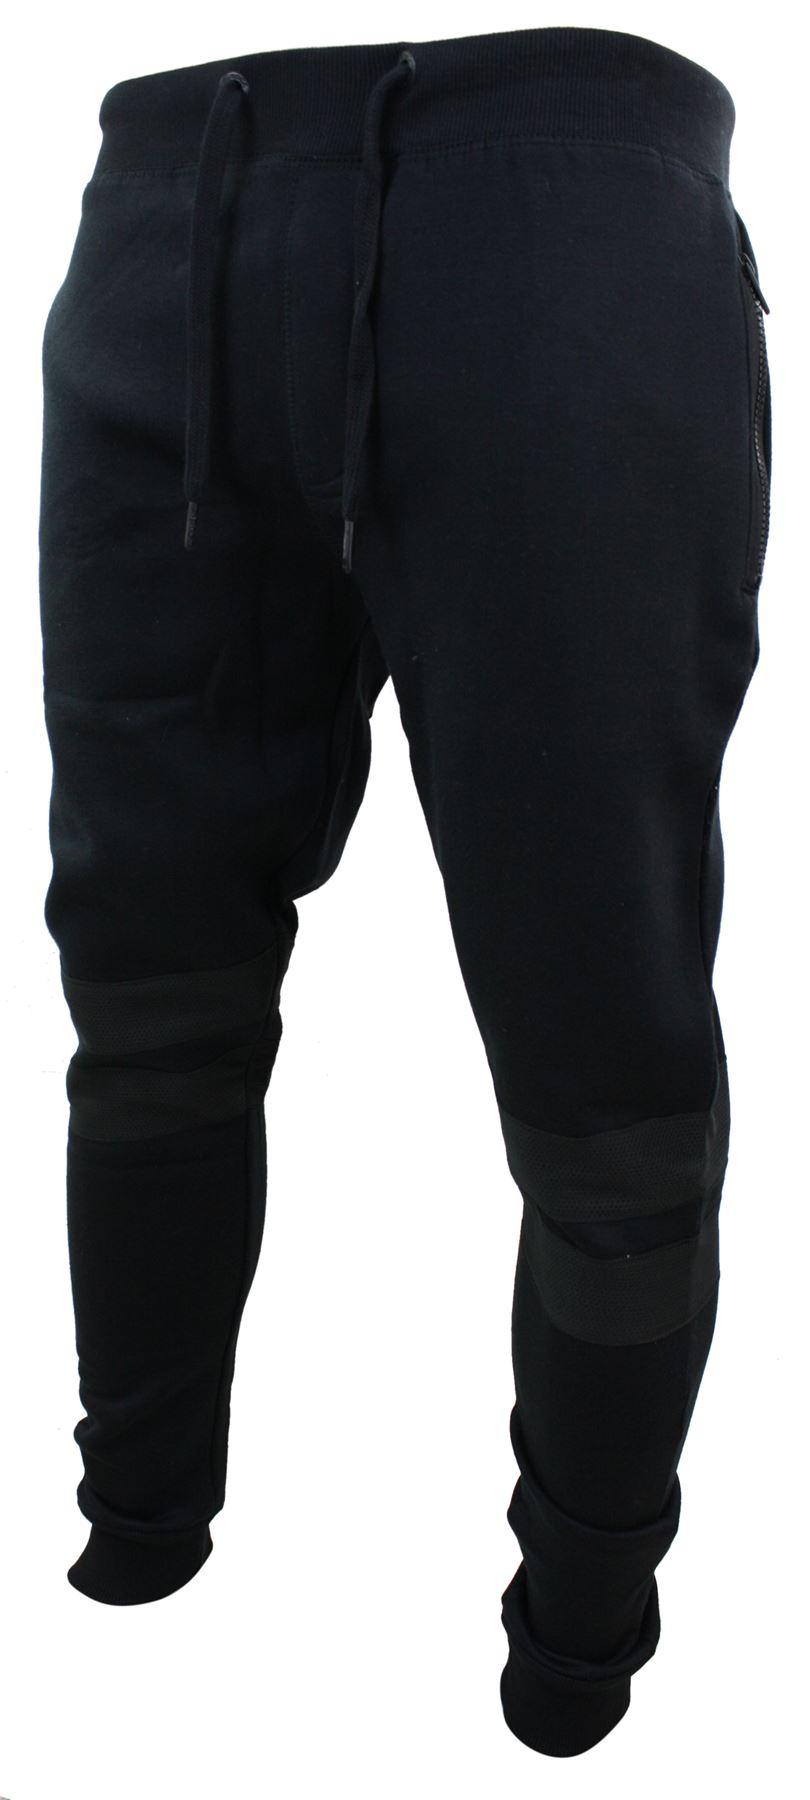 Herren Trainingsanzug TailoROT Fit Grau und Creme Pulli und Grau Hose Funky Design 36a07c